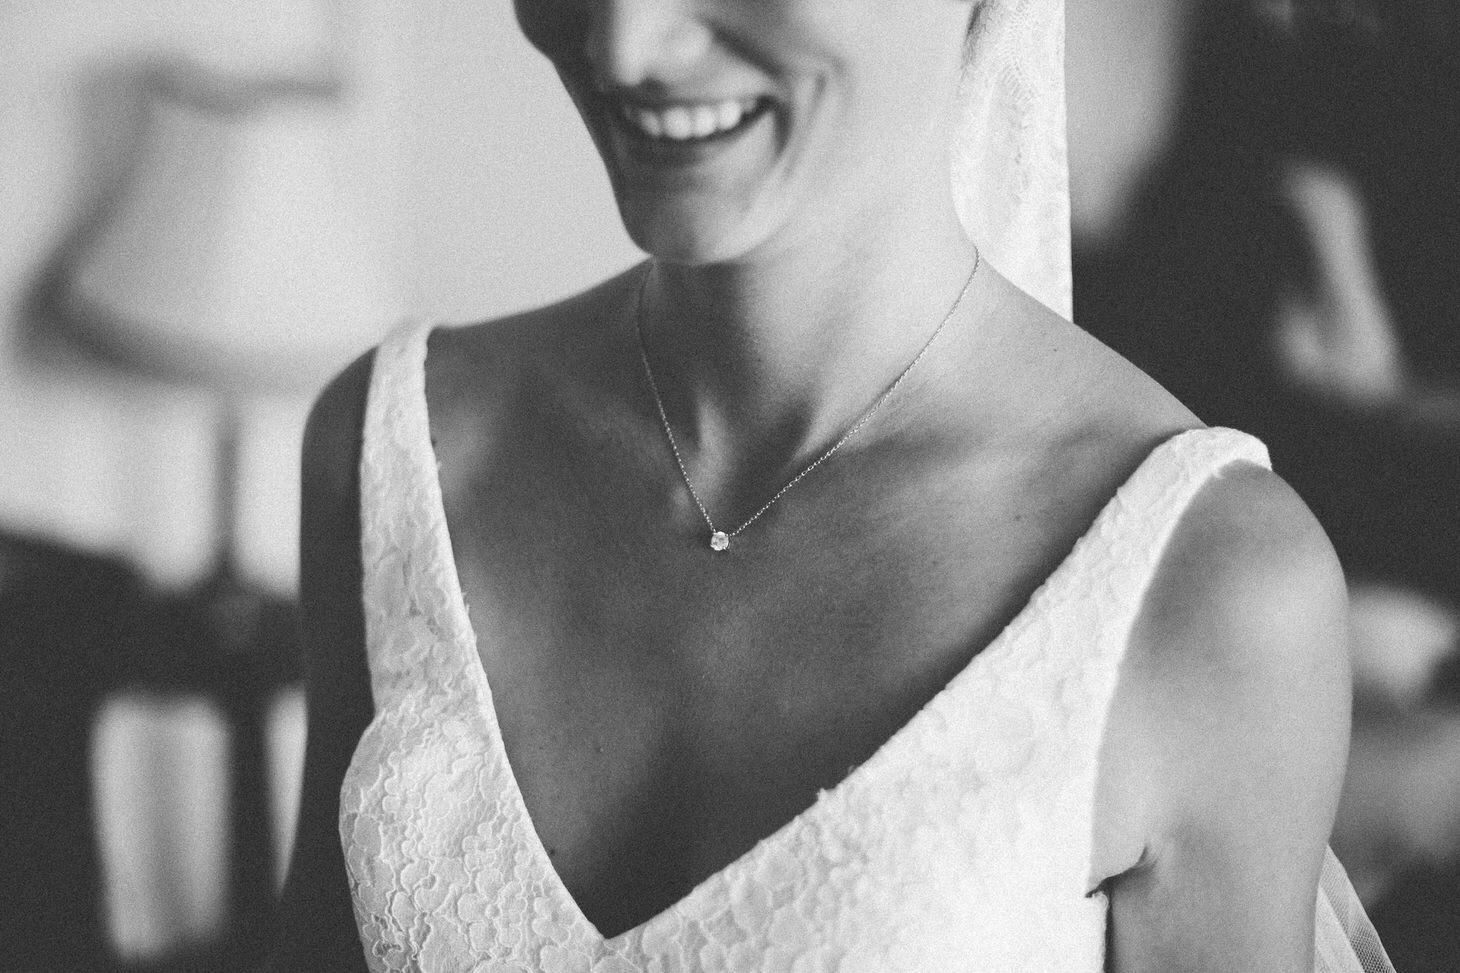 photographe-mariage-paris-montfort-l-amaury-015